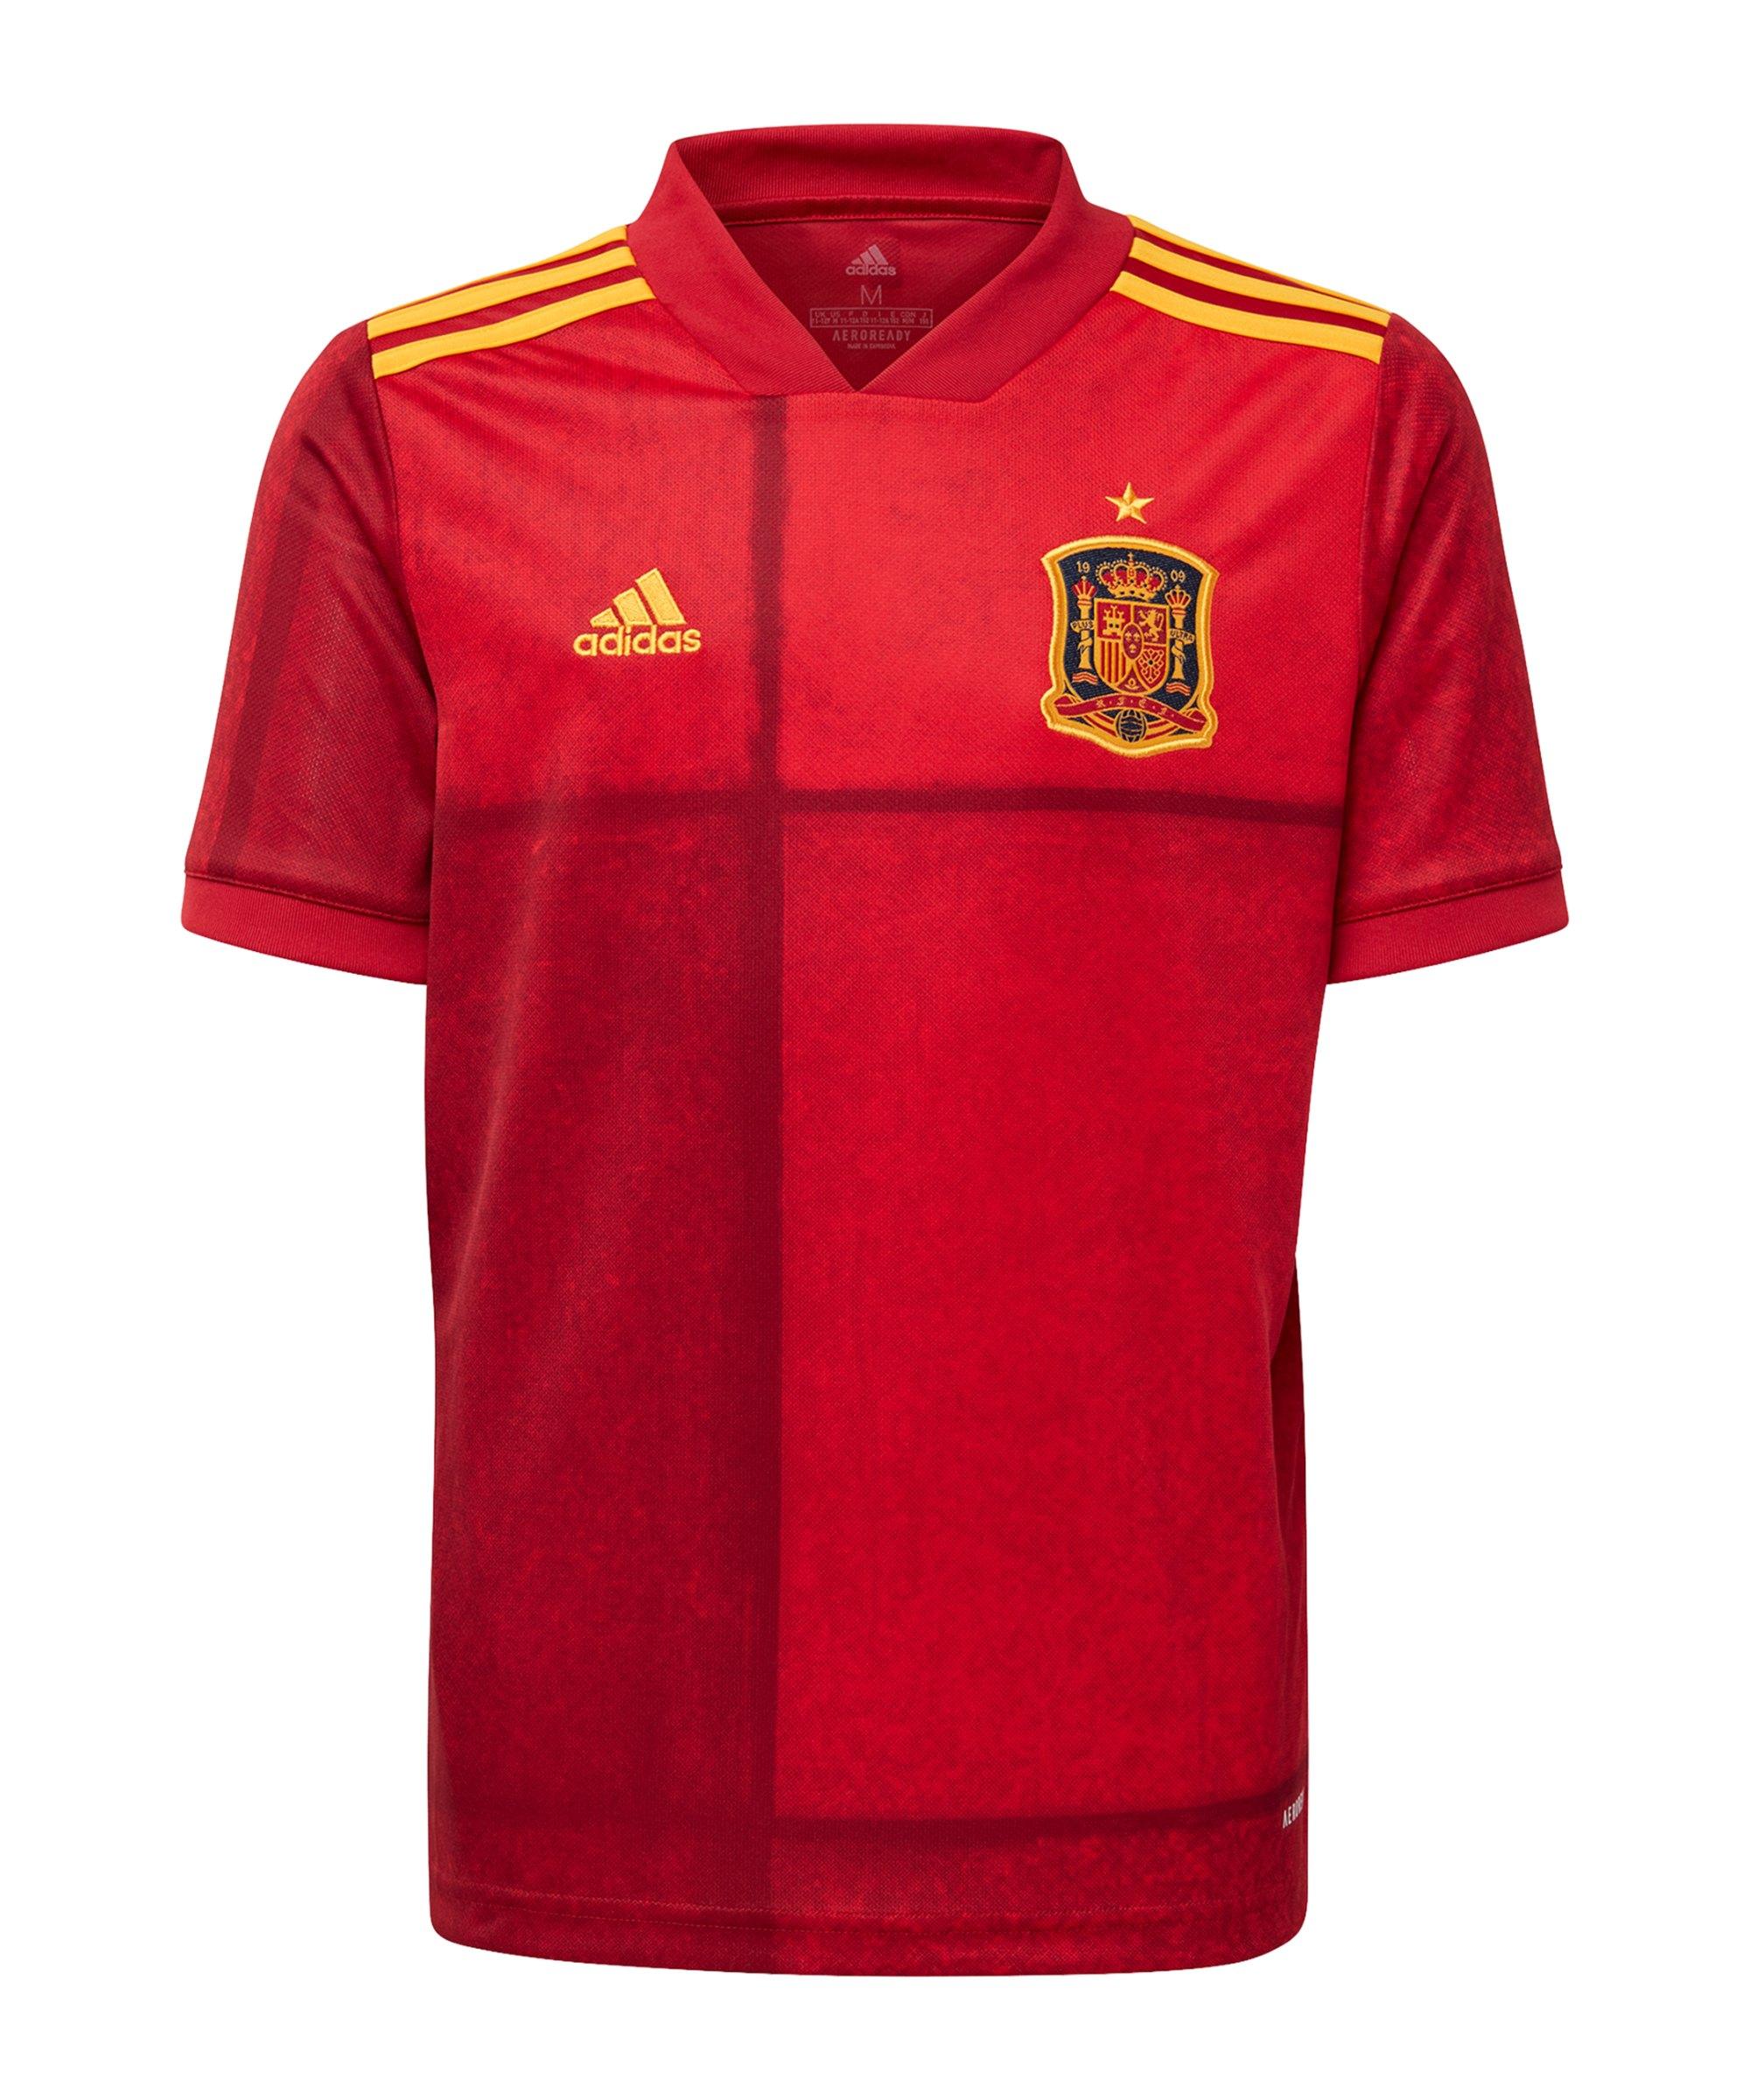 adidas Spanien Trikot Home EM 2020 Kids Rot - rot